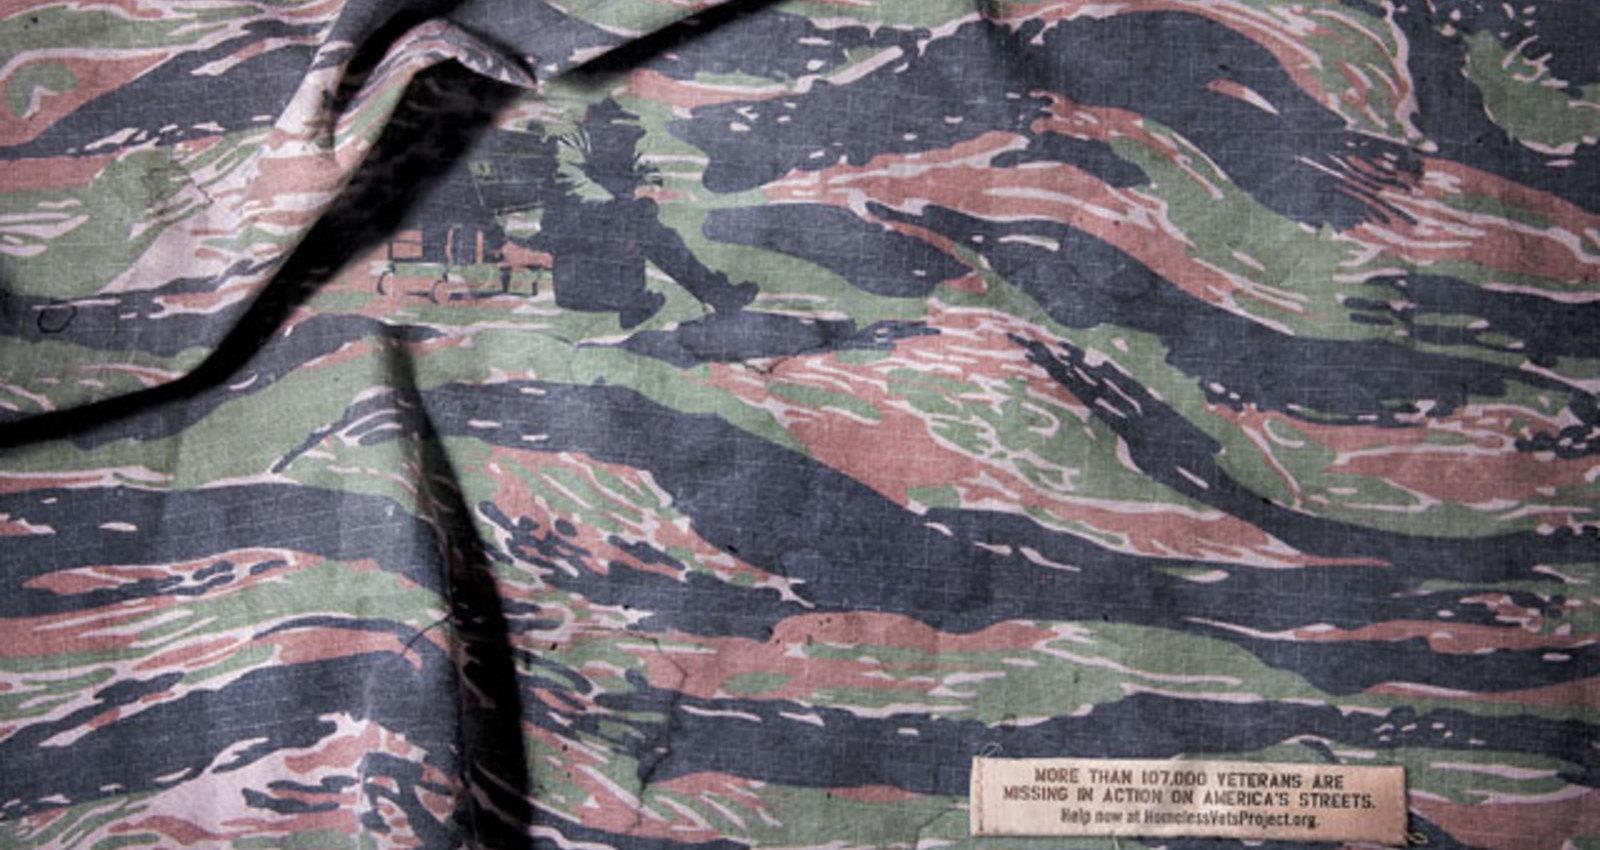 MIA Veterans